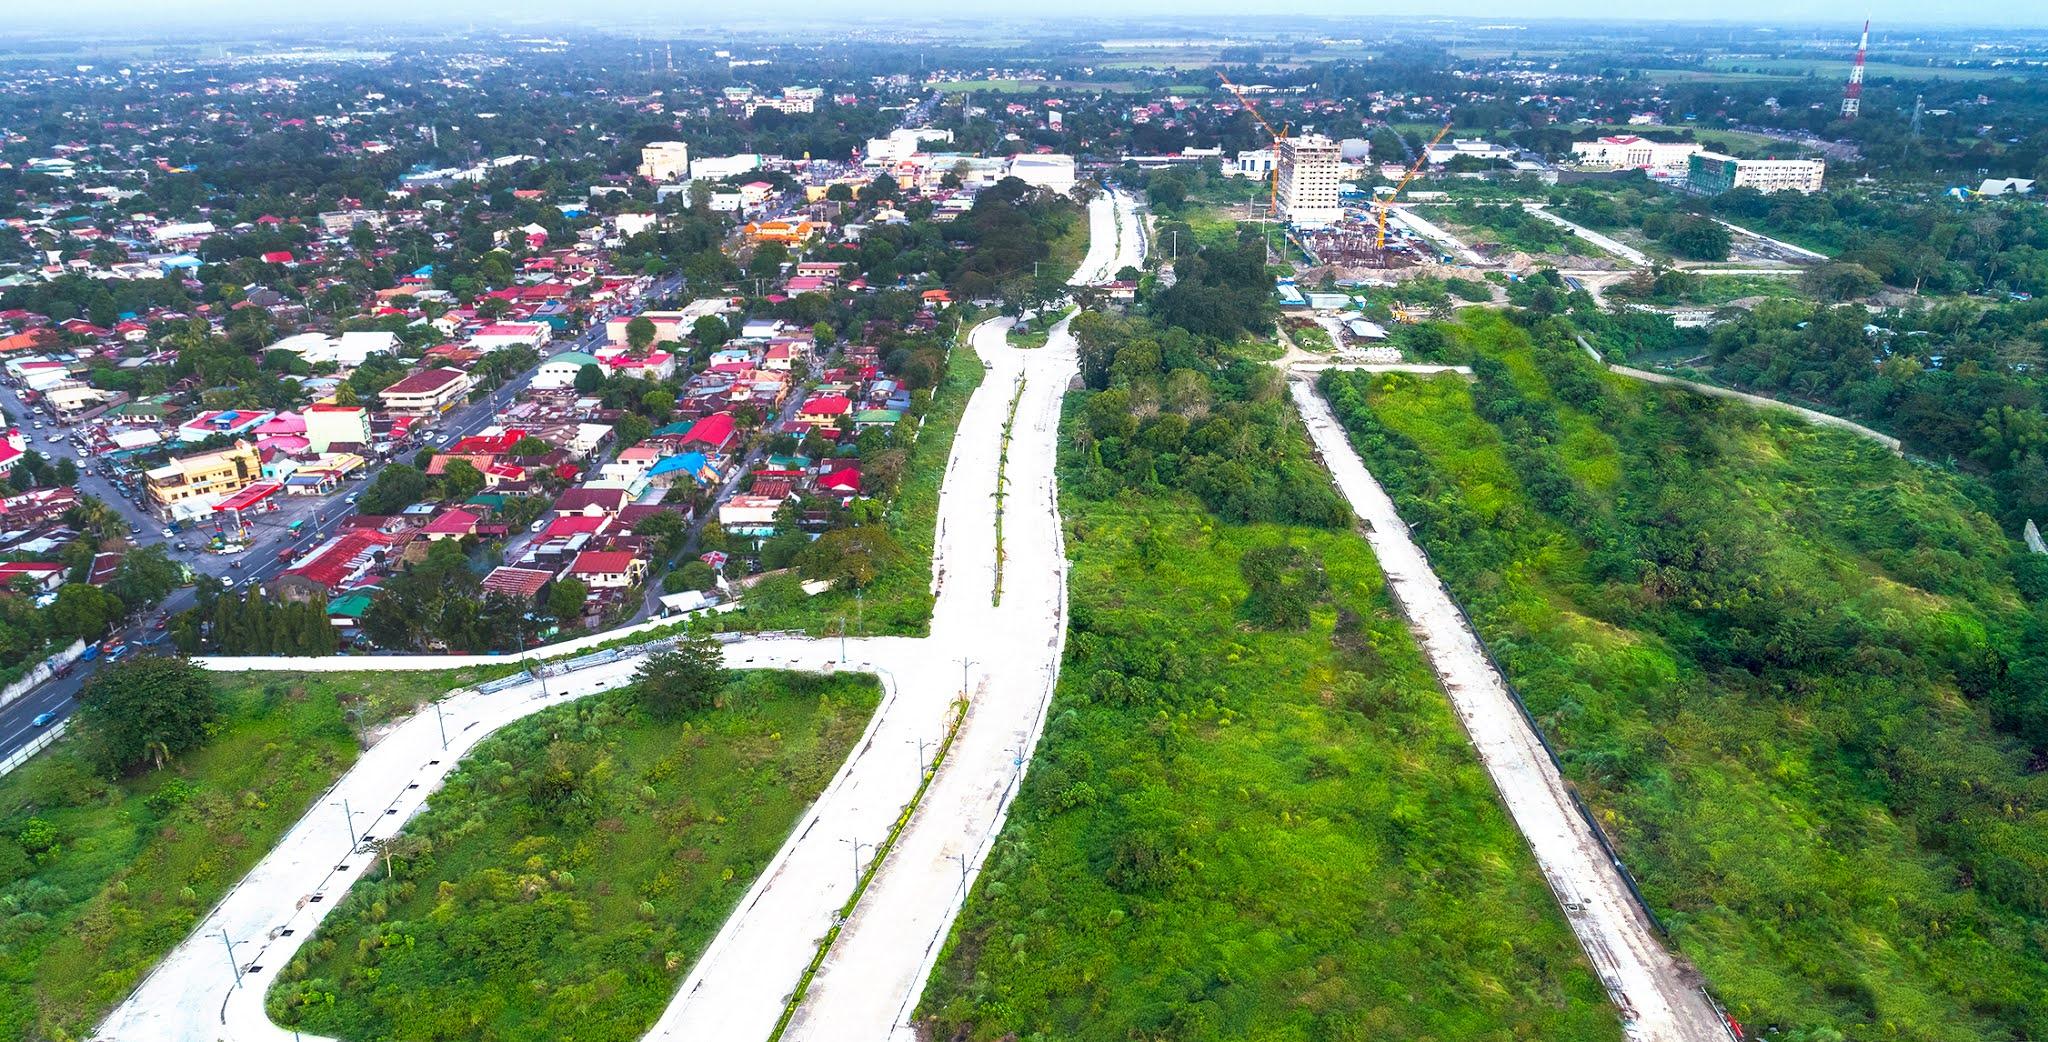 The Upper East Bacolod Megaworld